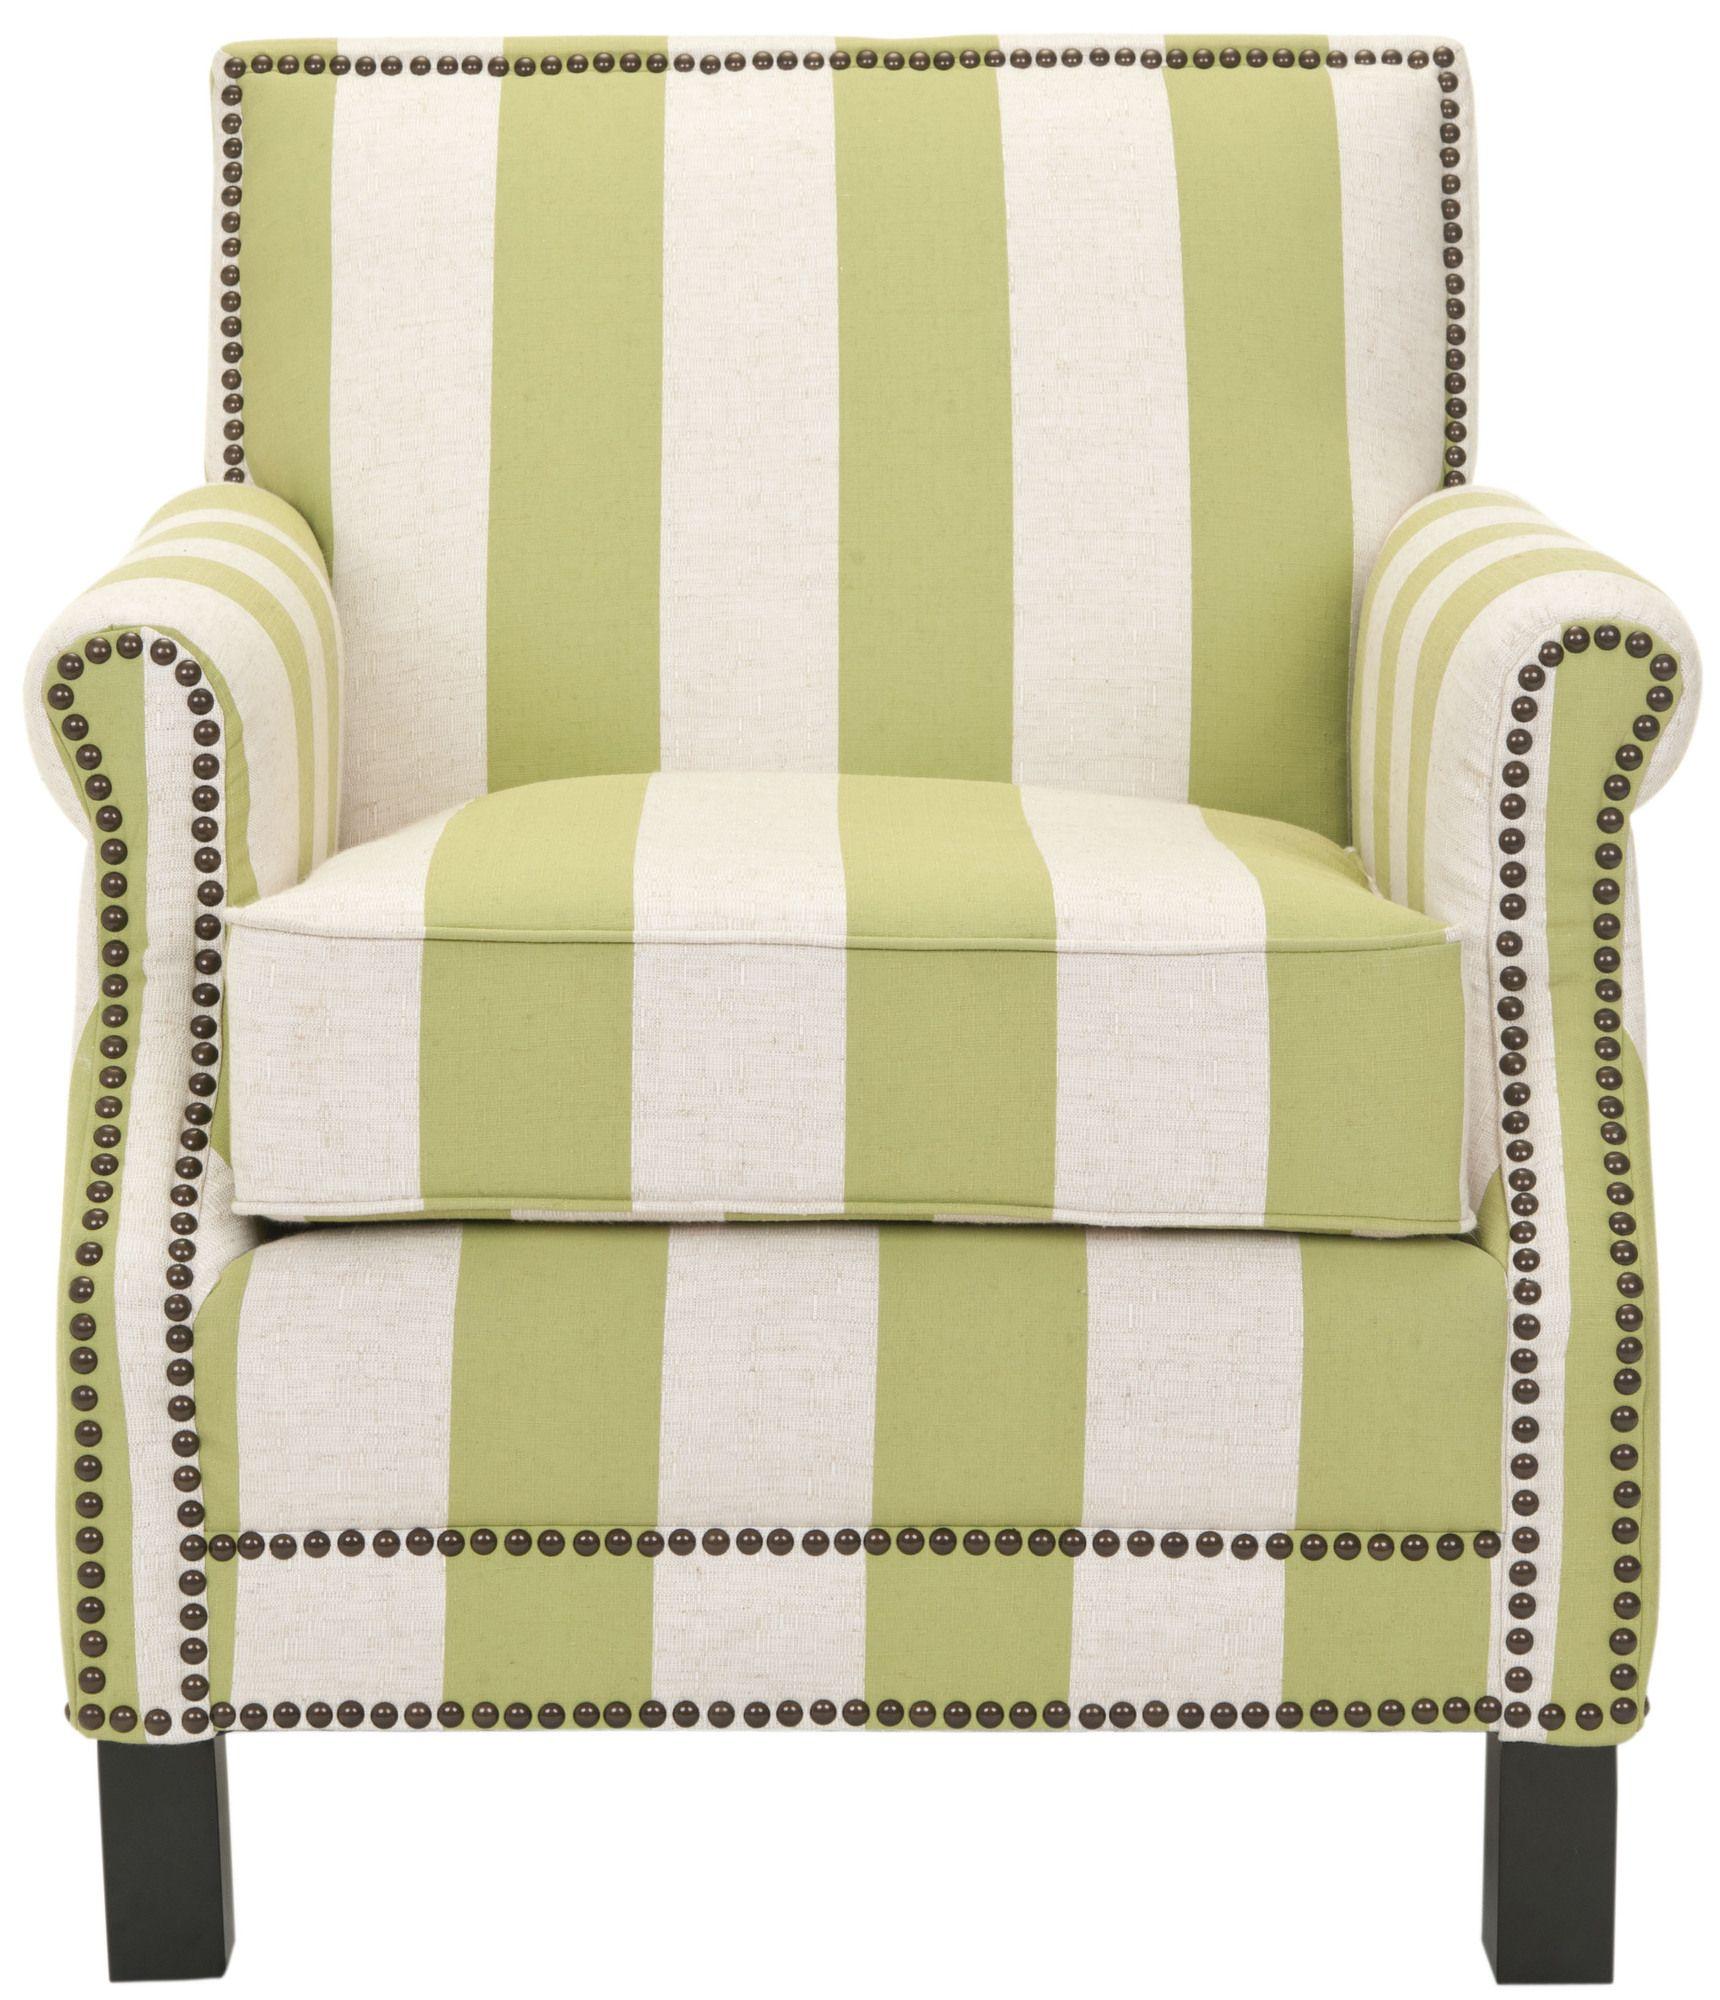 nice home goods site  Wayfair  Safavieh Alicia Club Chair. nice home goods site  Wayfair  Safavieh Alicia Club Chair   Our